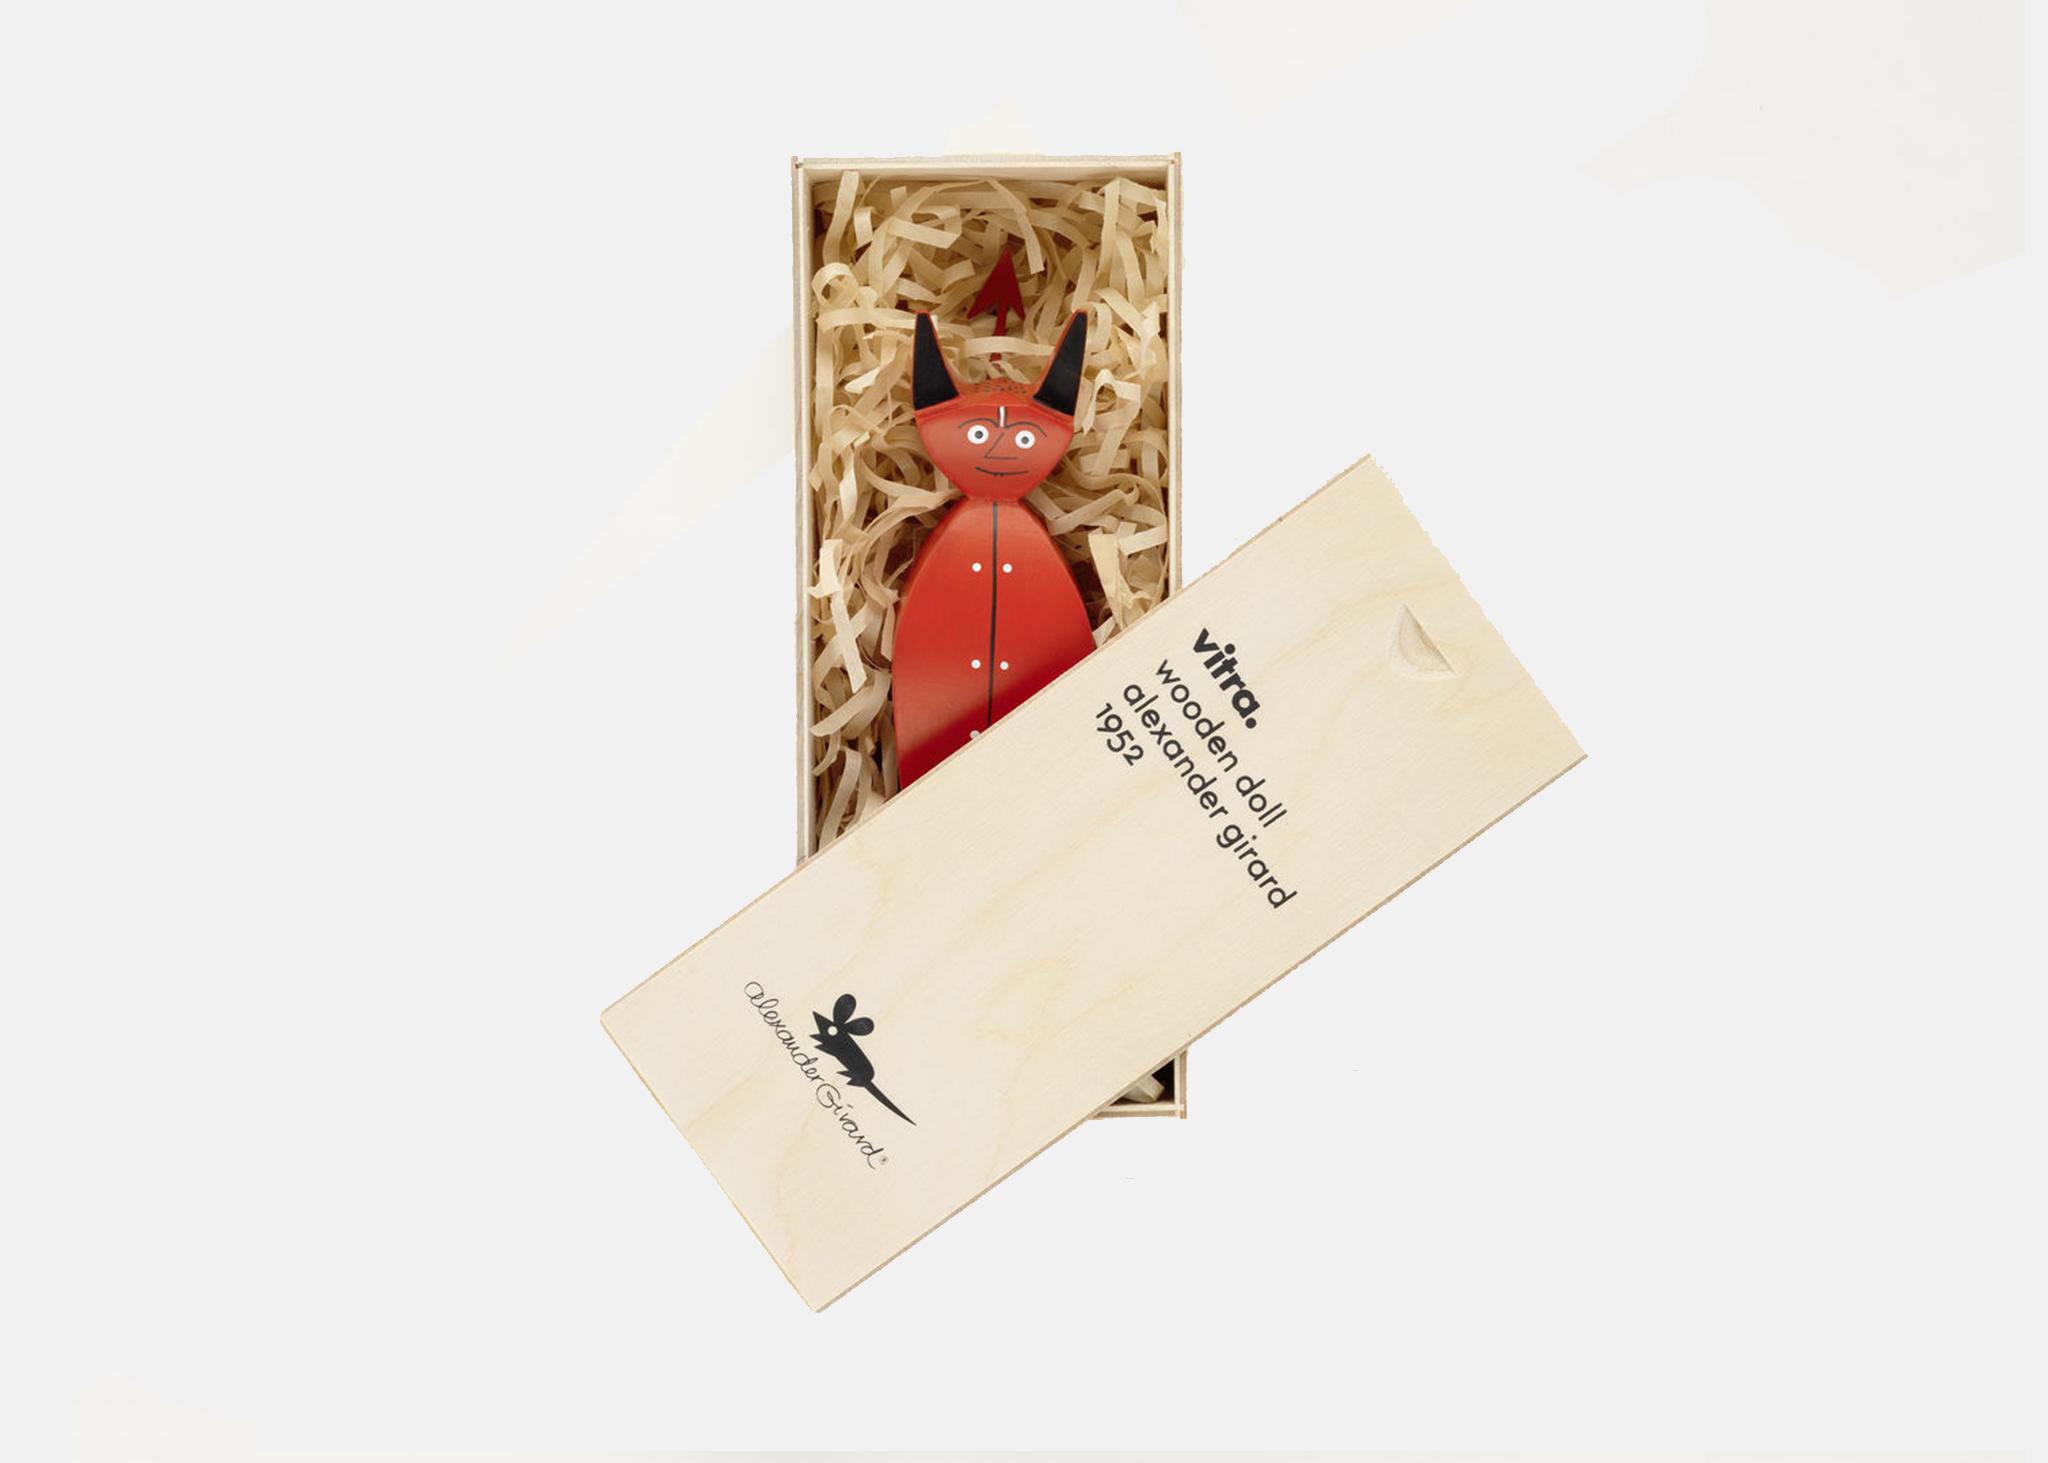 an image of a red devil figurine inside a casket